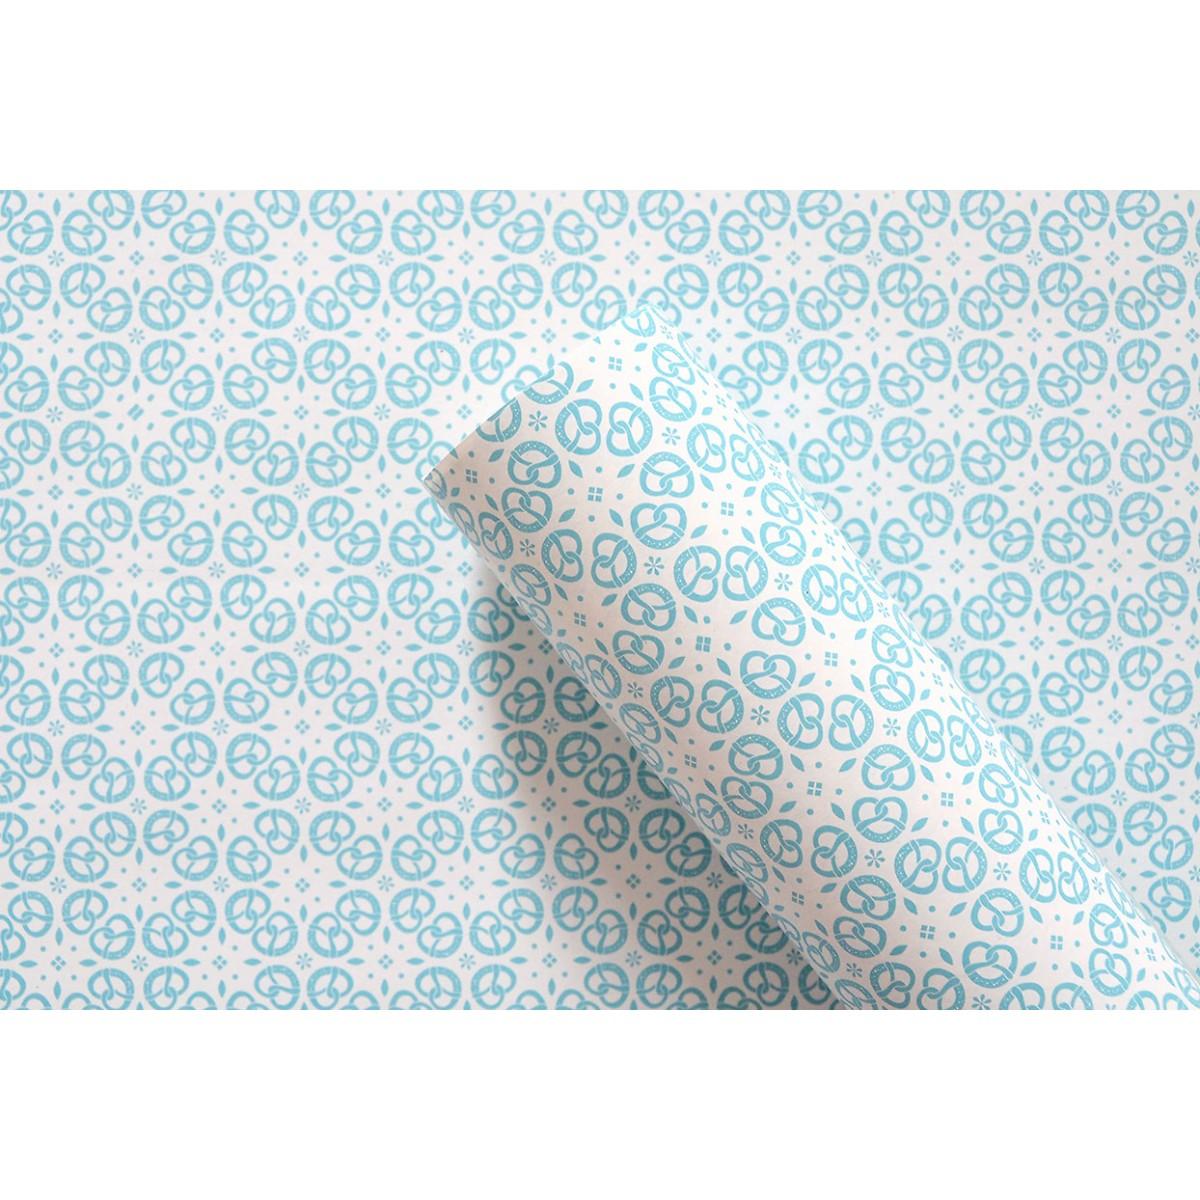 Geschenkpapier BREZEN Ornament blau // 3 Bögen